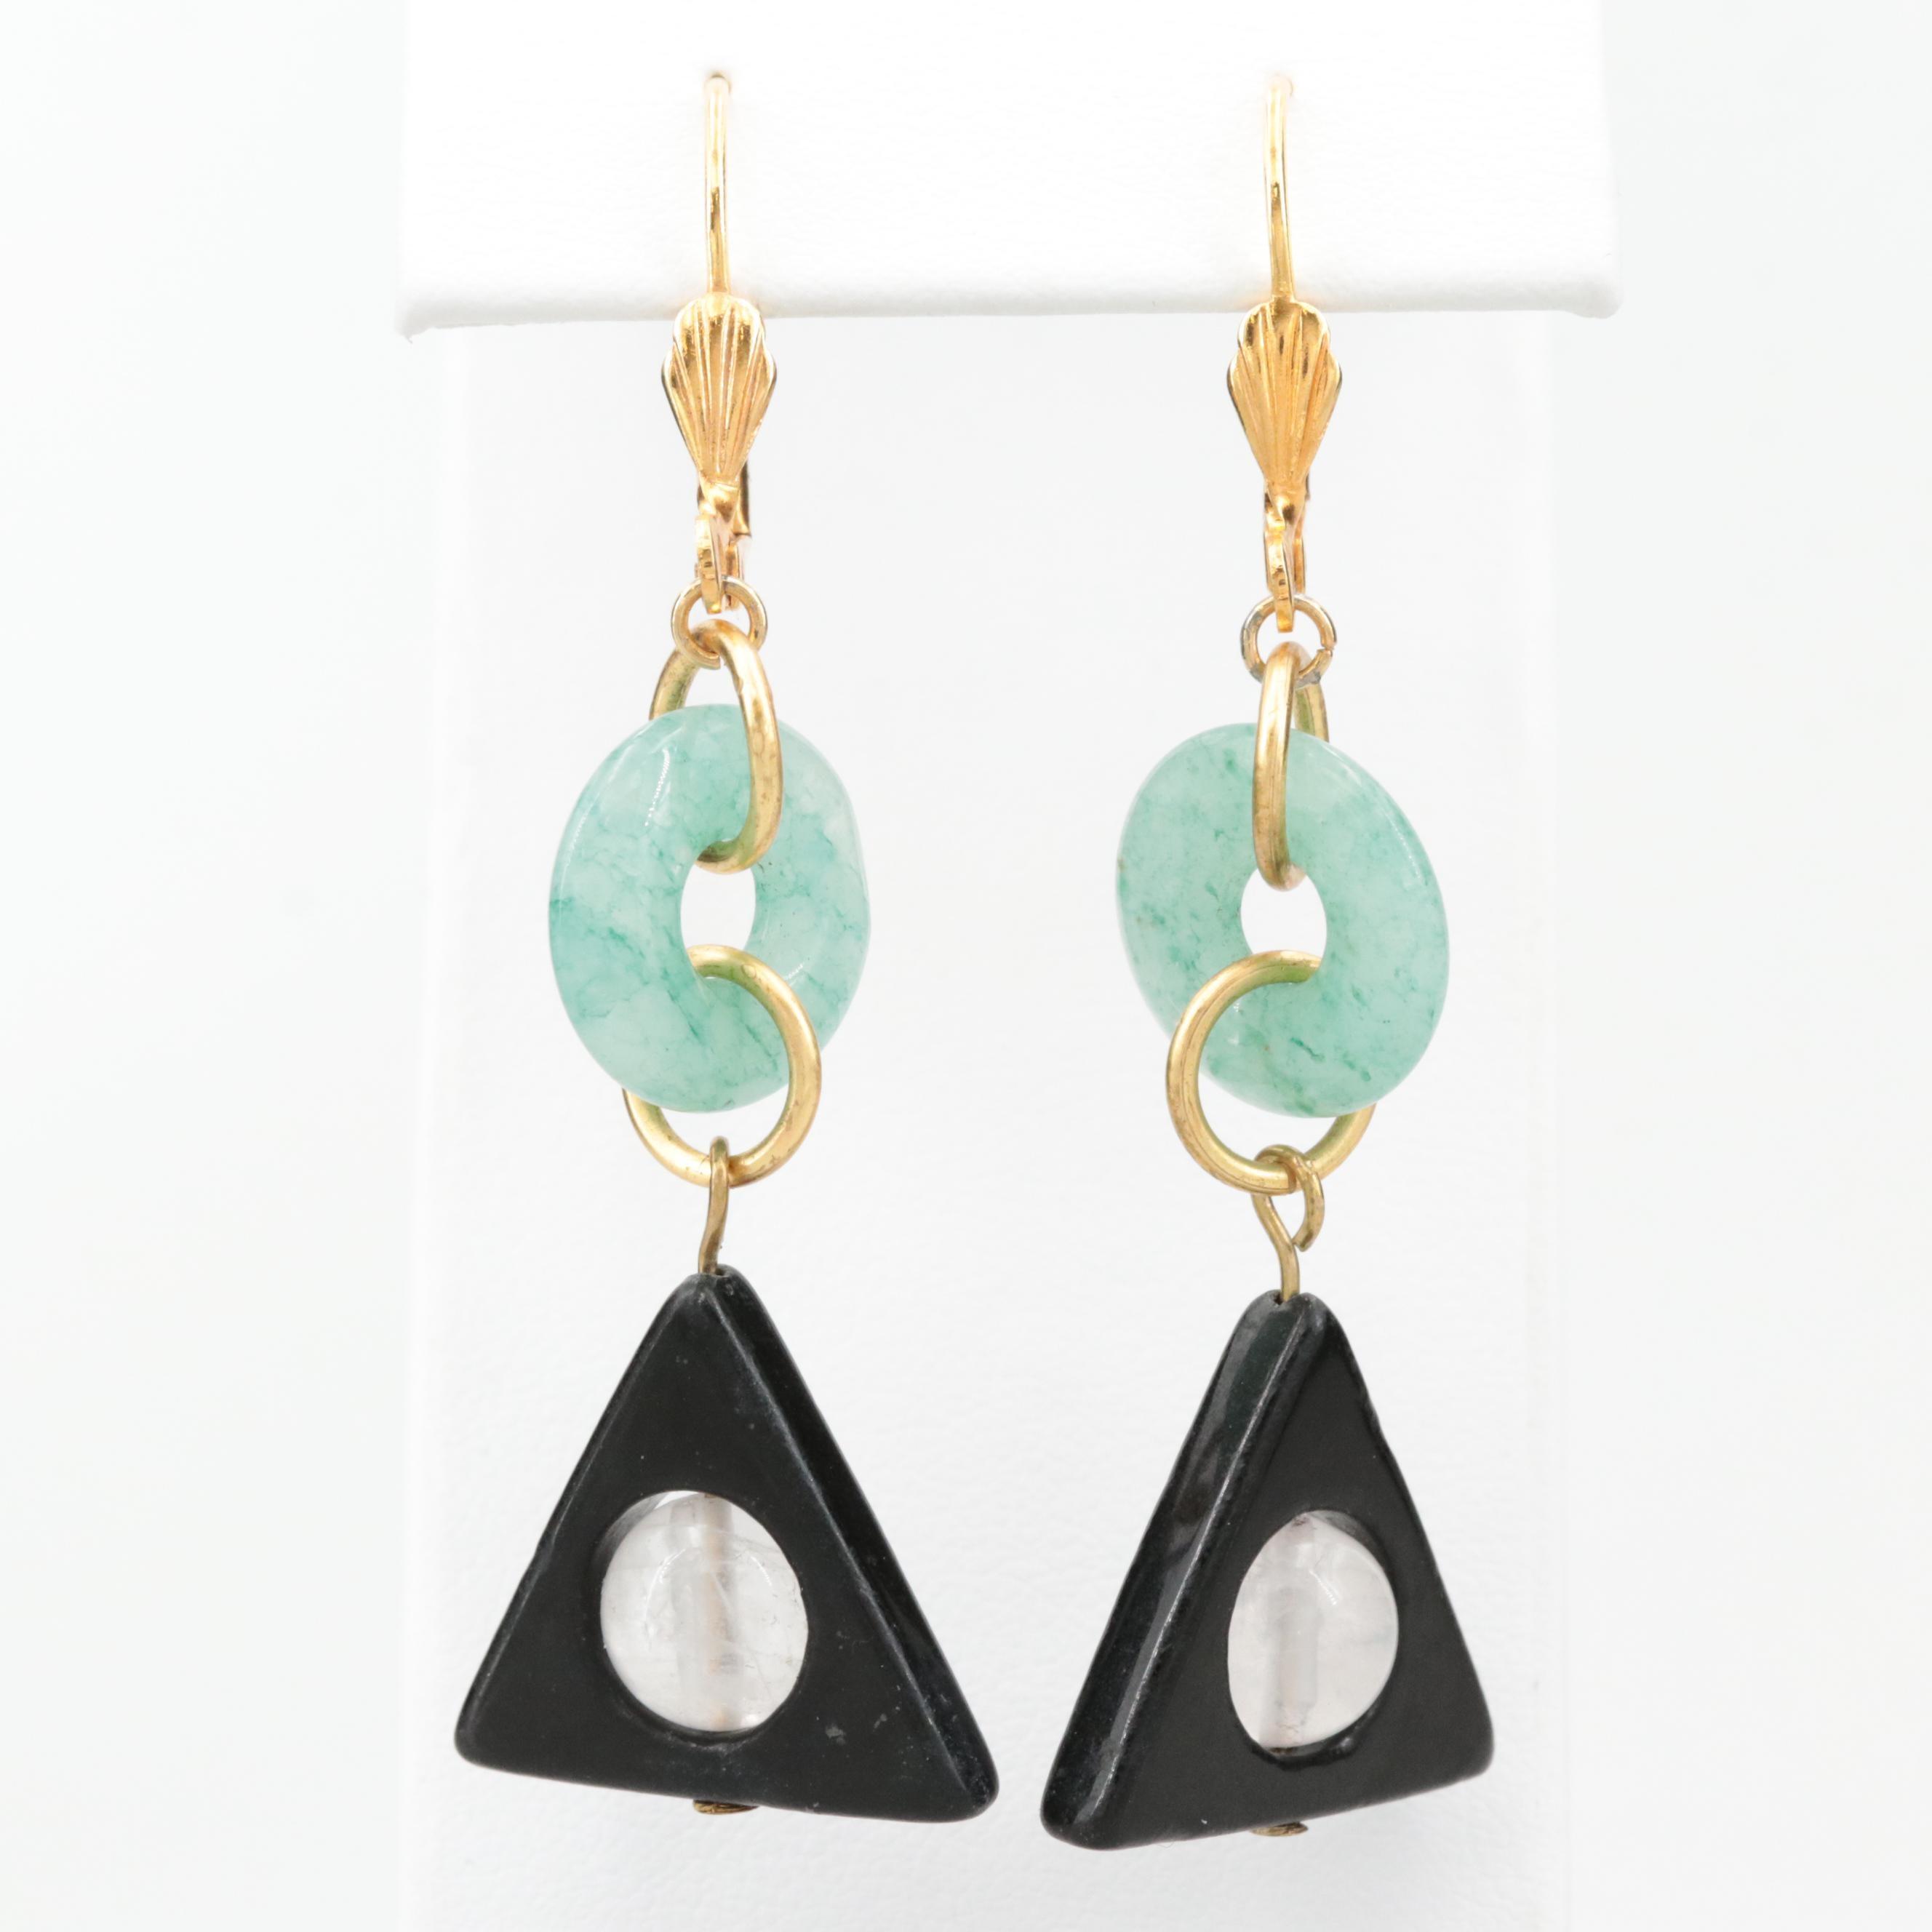 Rose Quartz, Quartz and Black Onyx Dangle Earrings